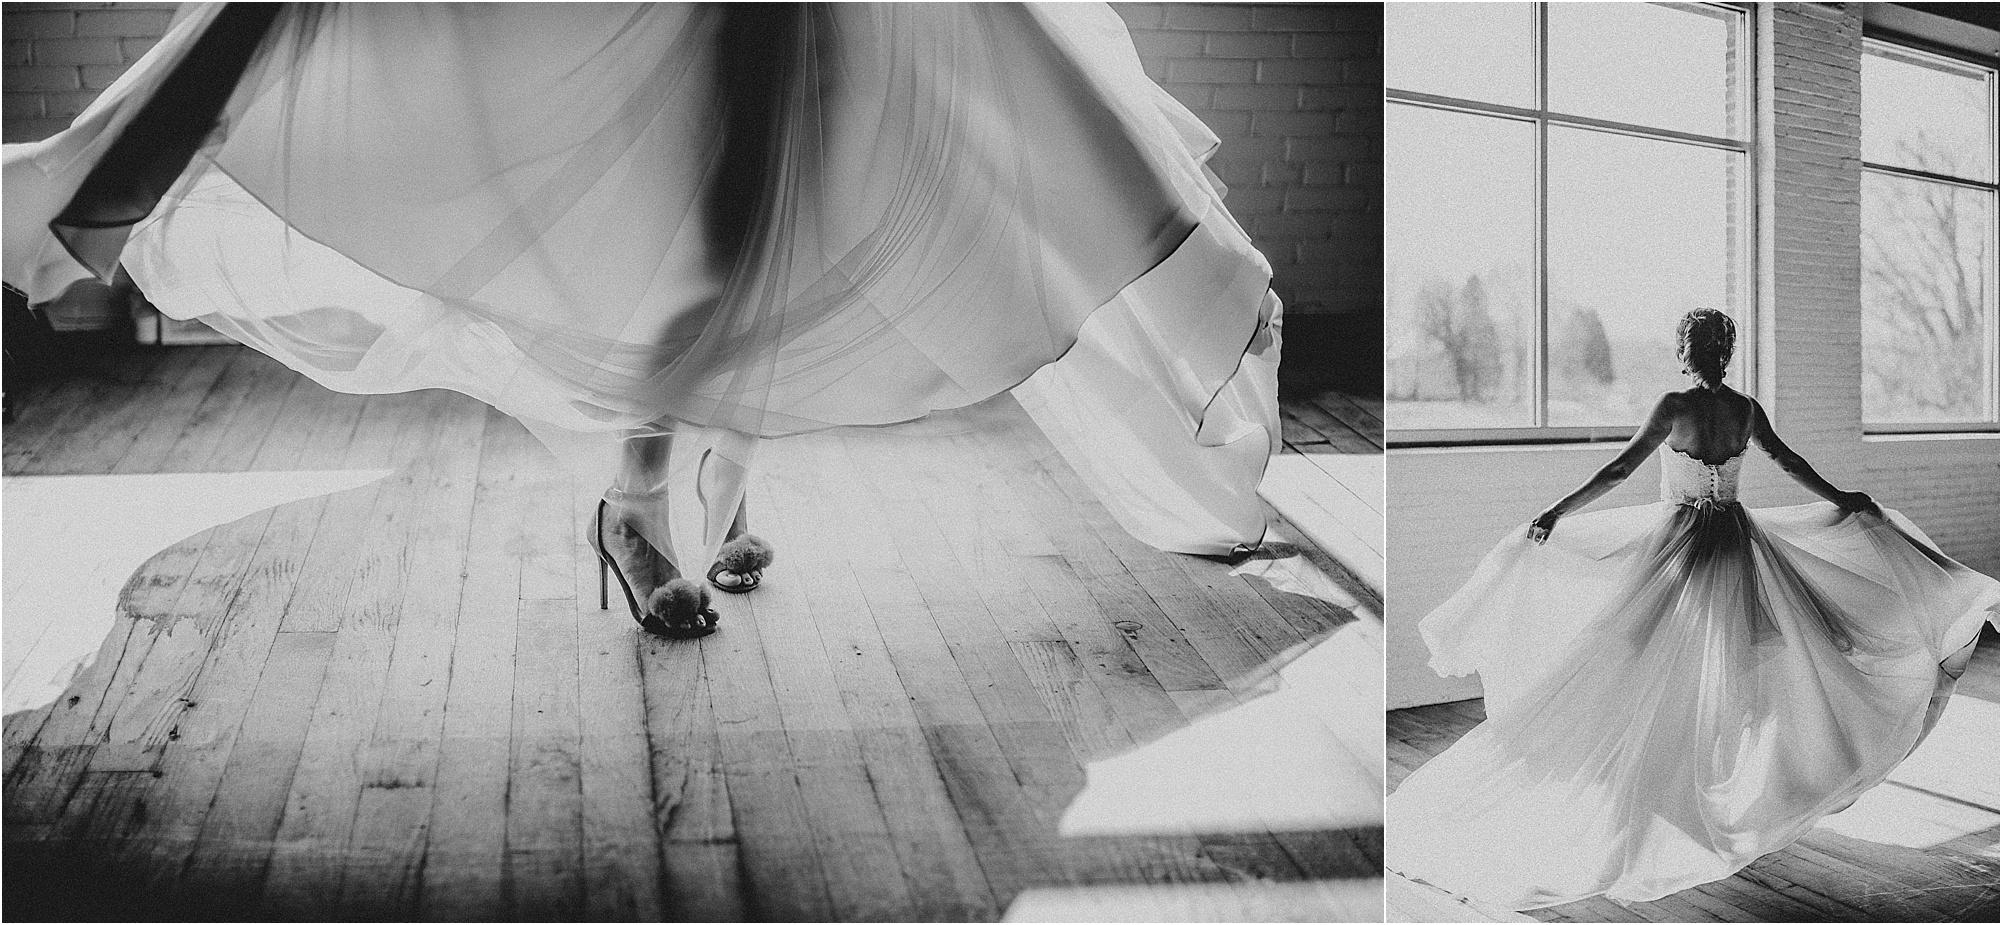 Old-South-Vintage-Rentals-Bride-avonne-photography_0008.jpg